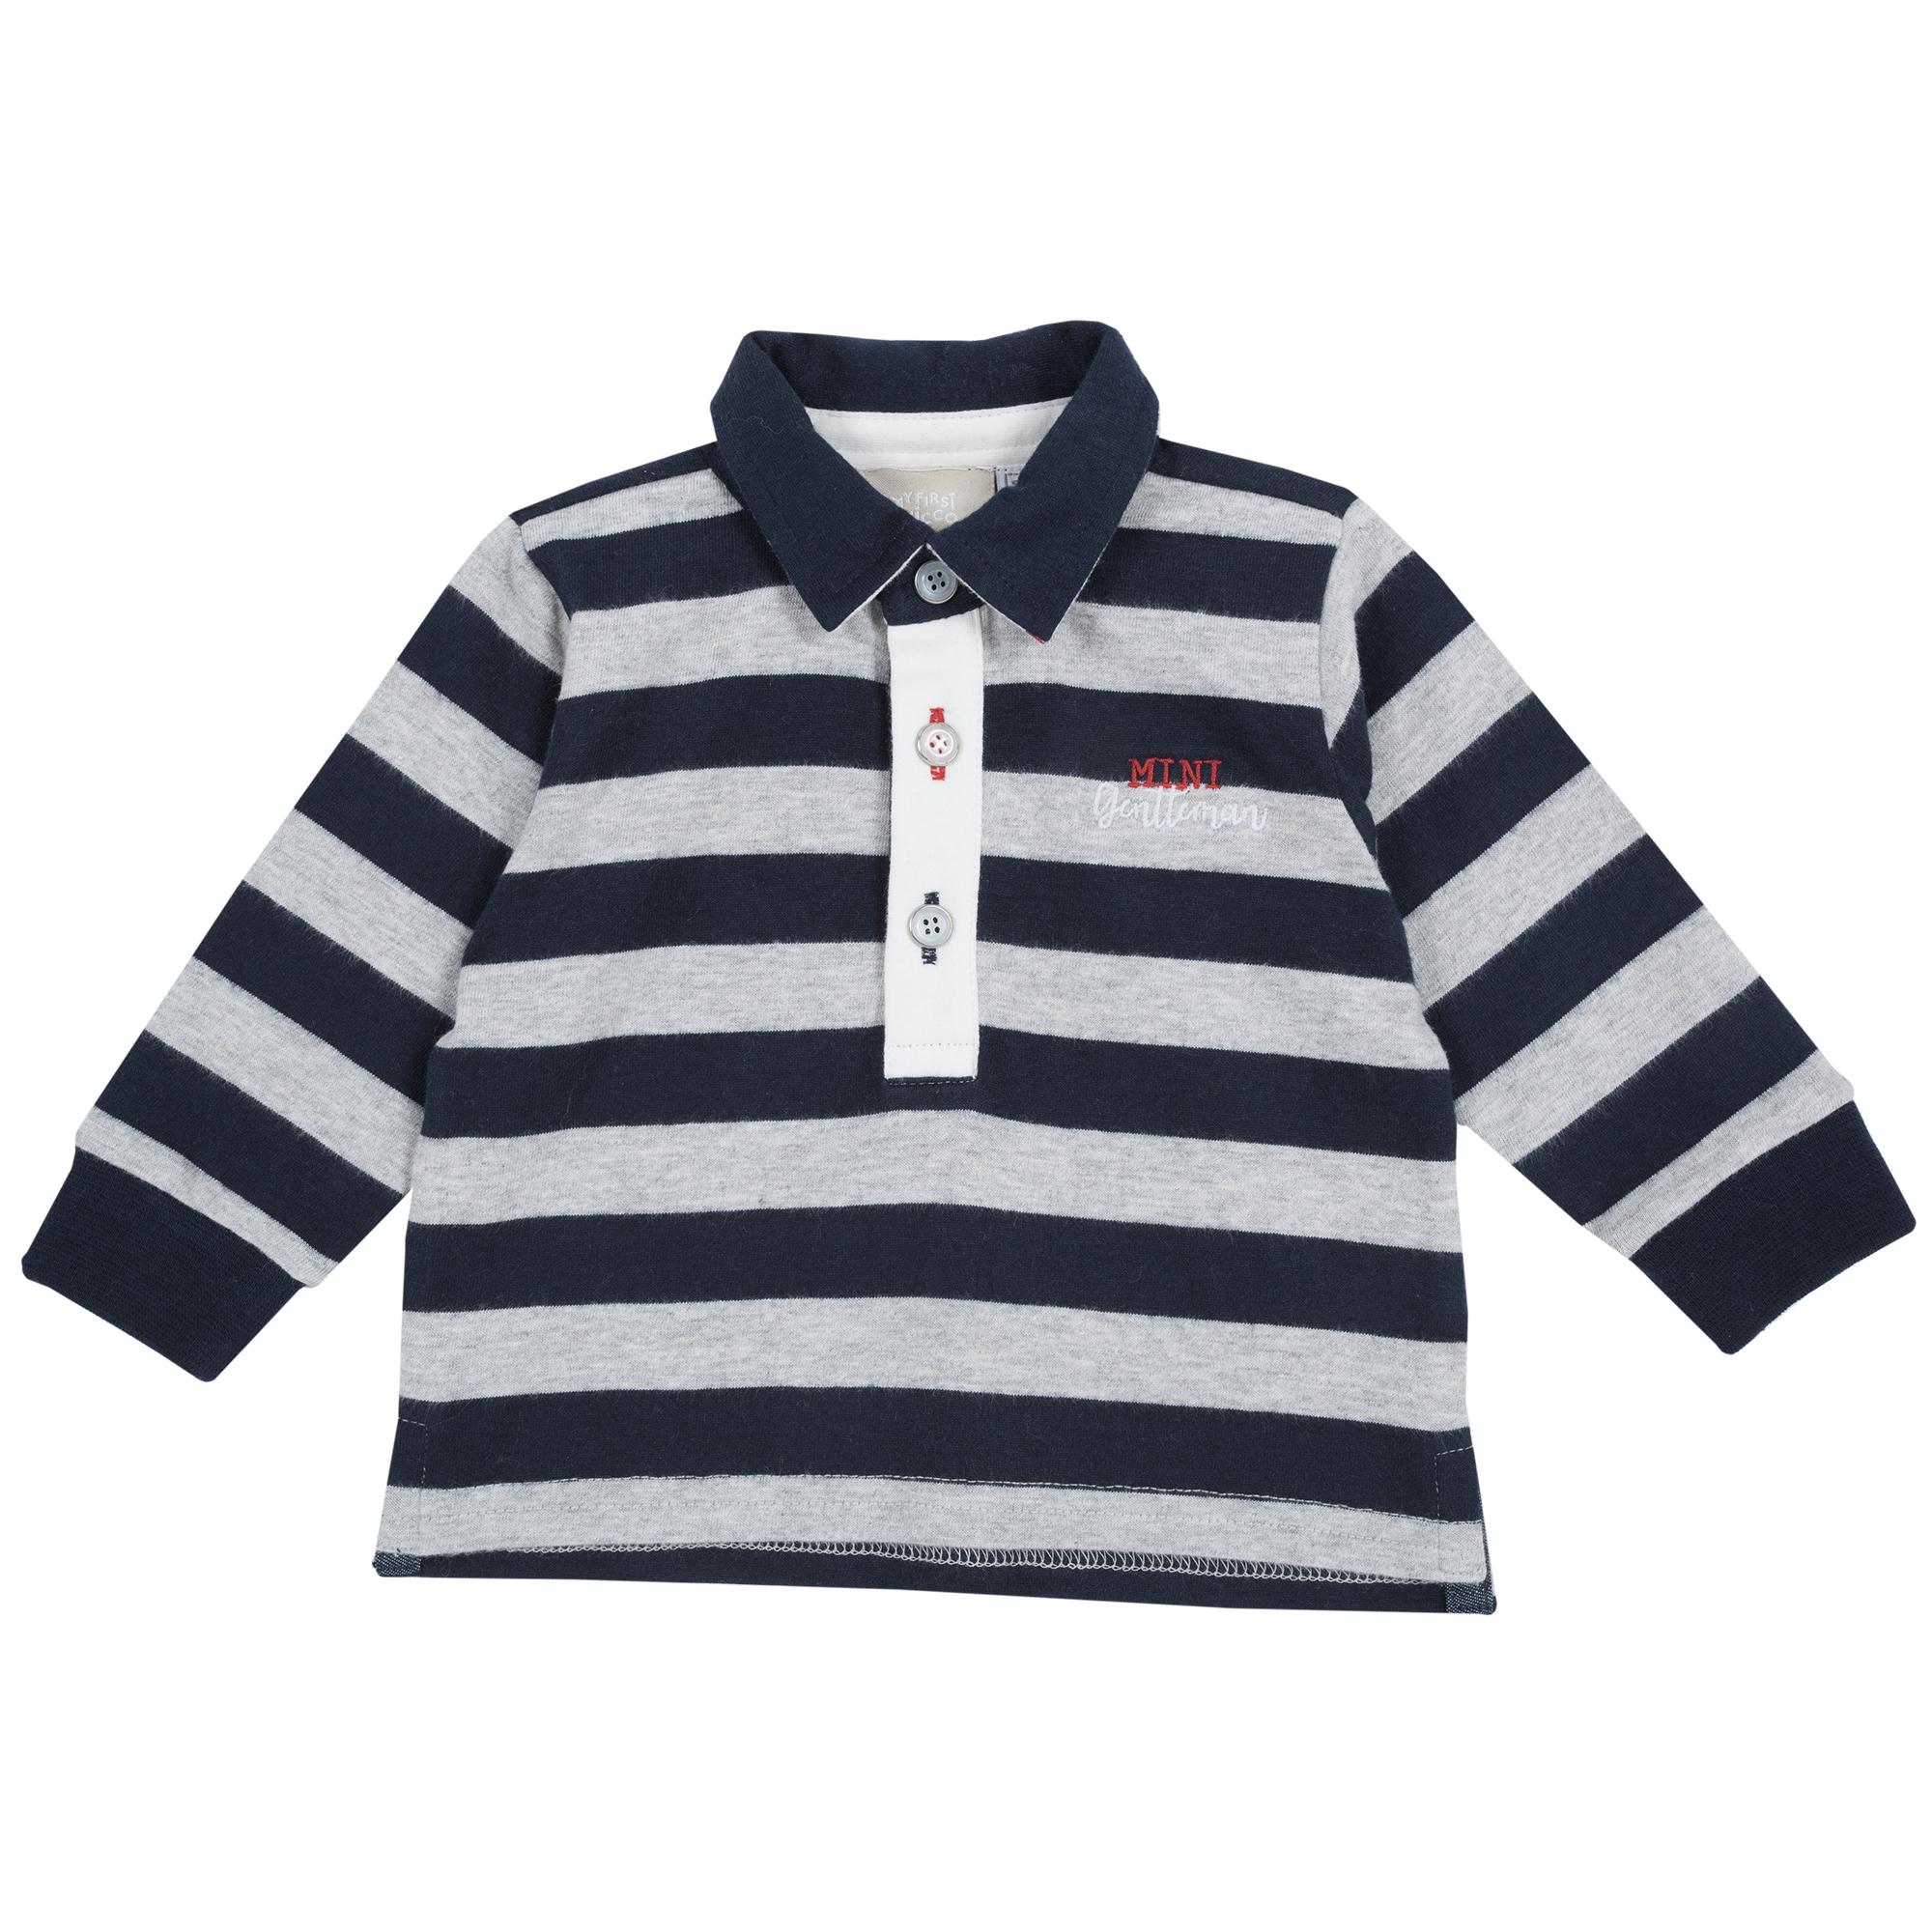 Tricou copii Chicco, bleumarin, 33455